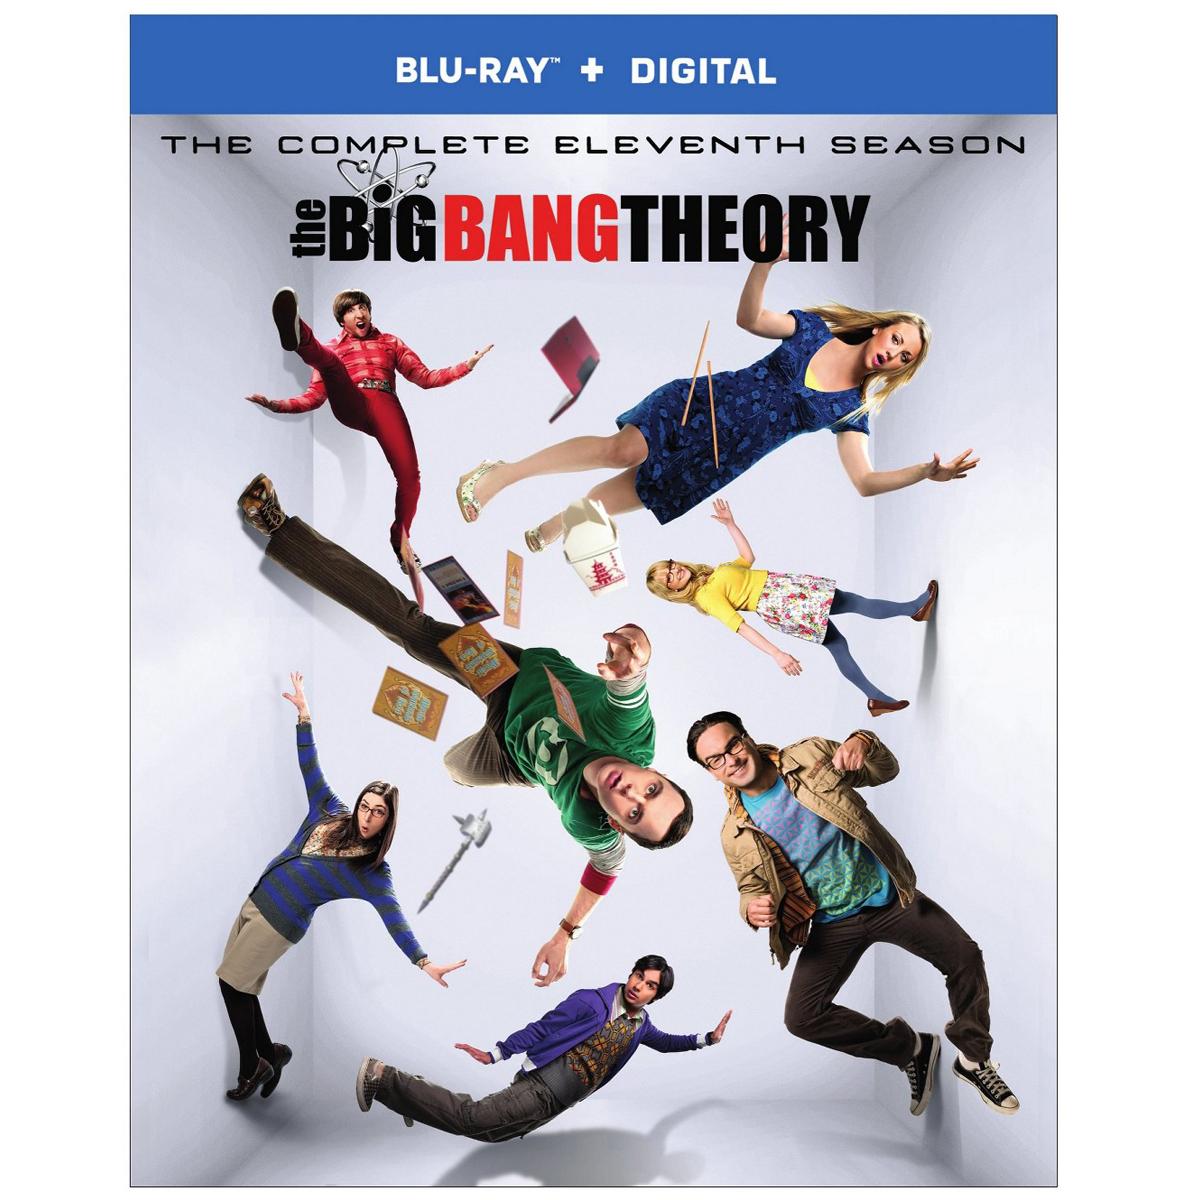 The Big Bang Theory: Complete Eleventh Season Blu-Ray